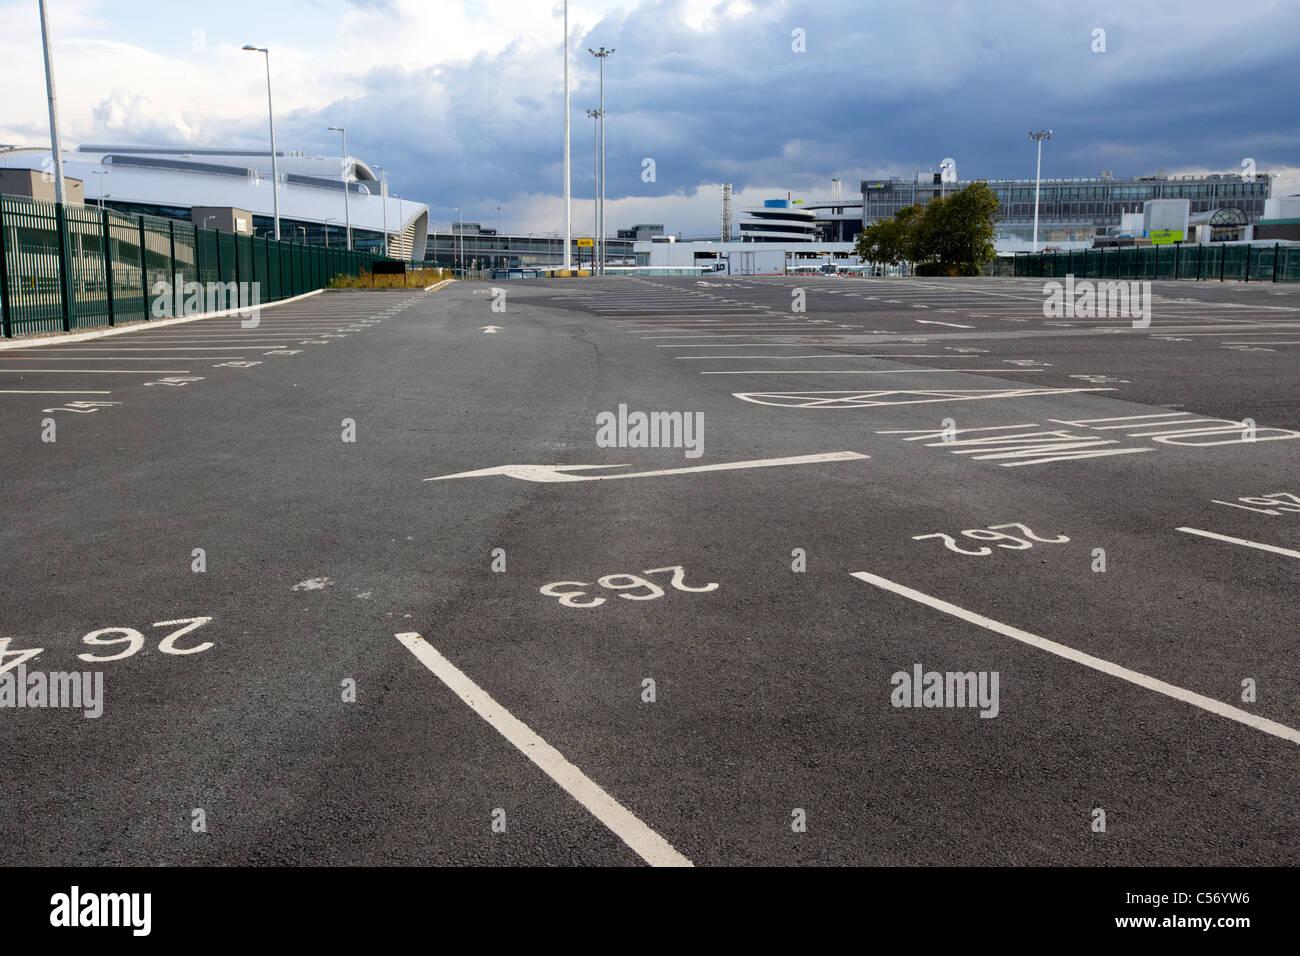 empty car park parking lot at dublin airport republic of ireland europe - Stock Image